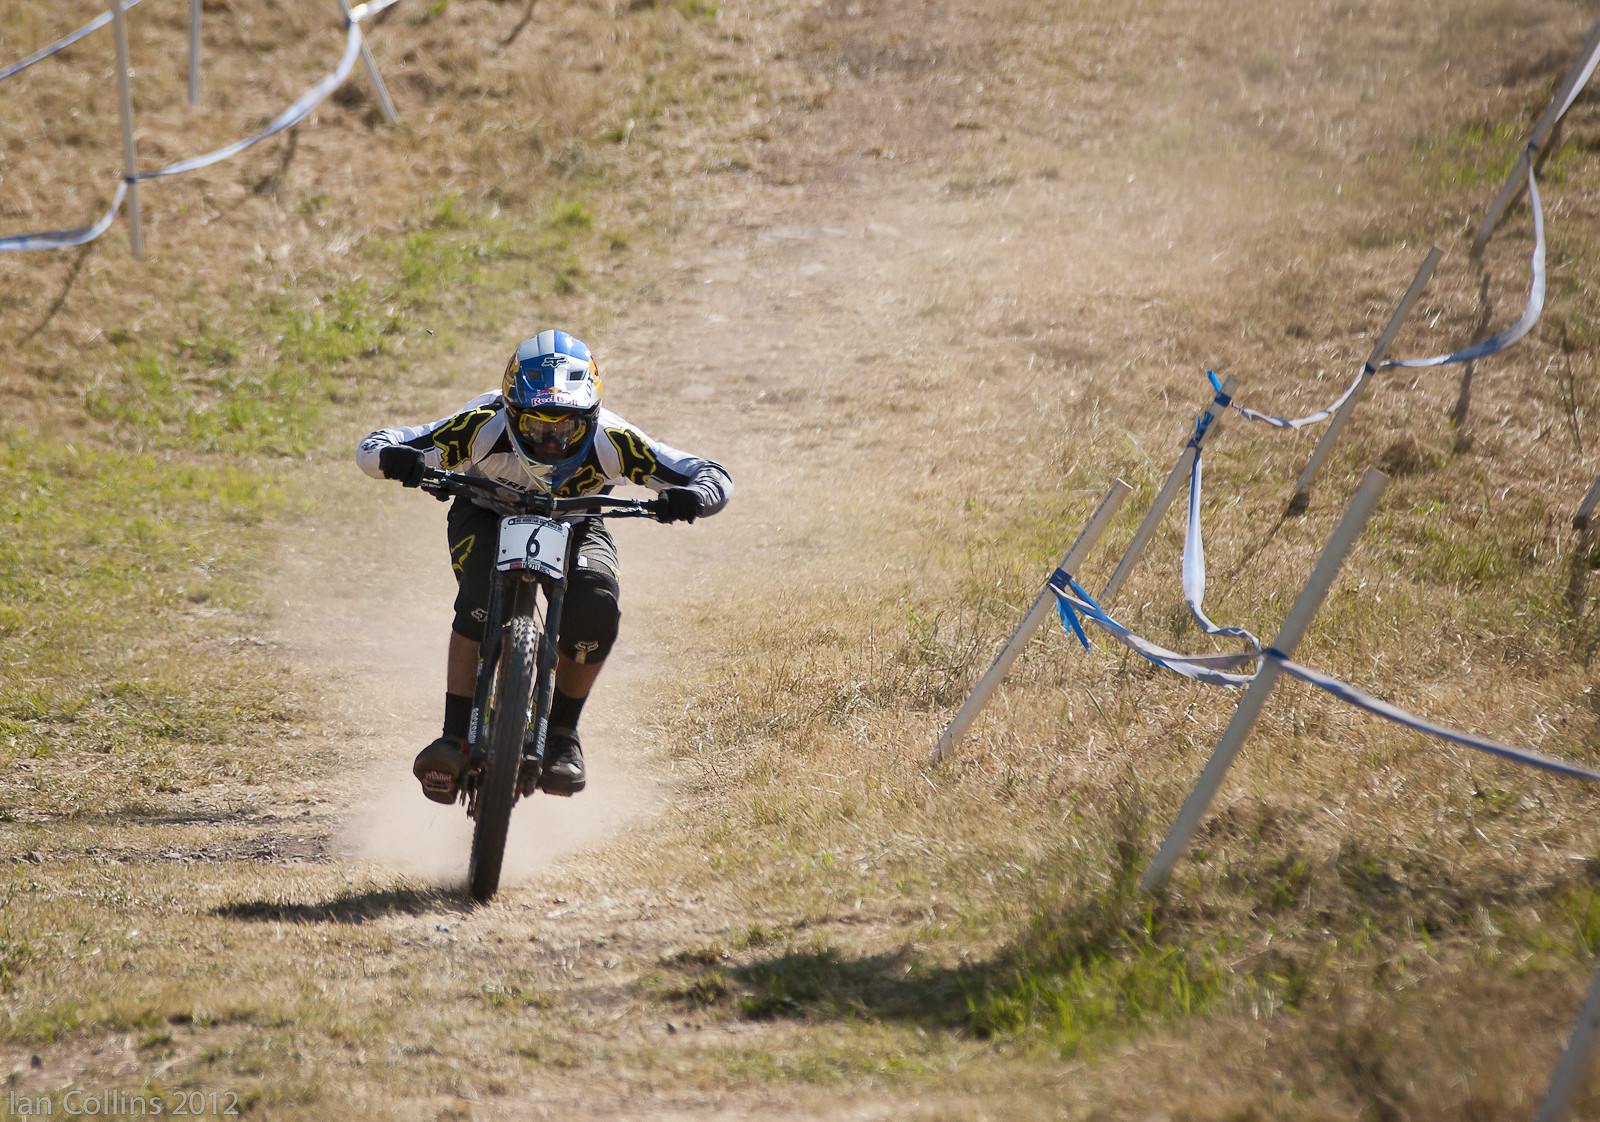 Steve Smith - Ian Collins - Mountain Biking Pictures - Vital MTB